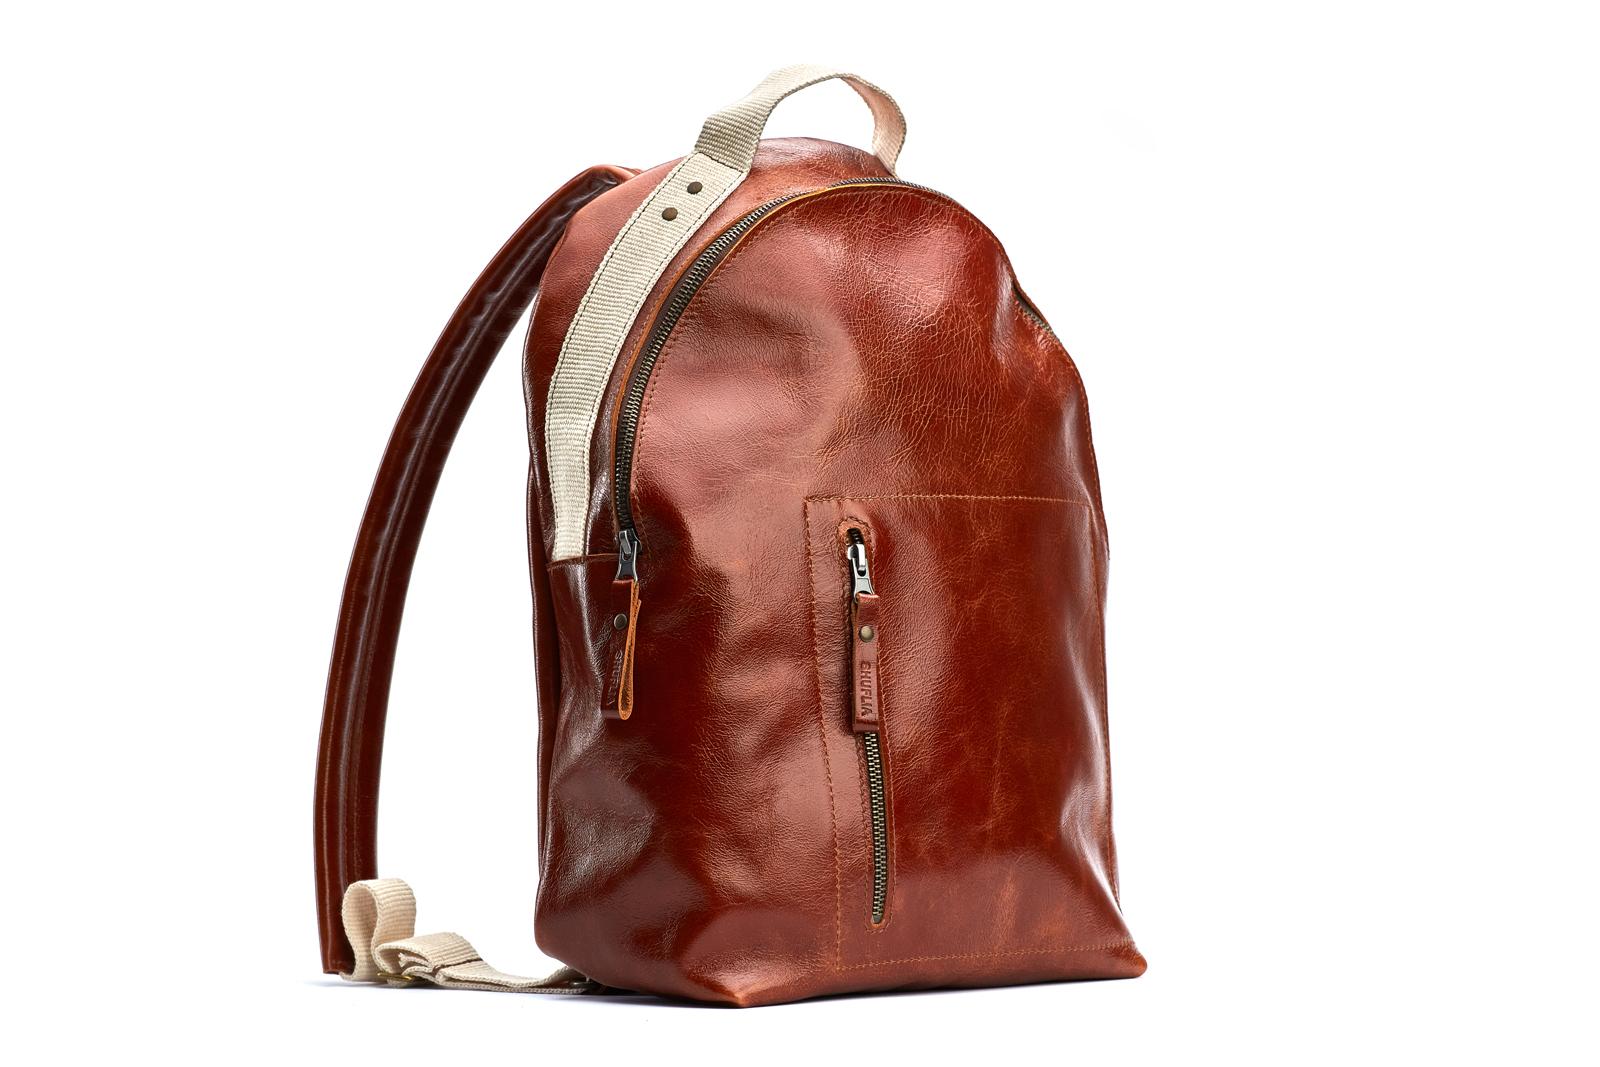 Шкіряний рюкзак YESTERDAY | Shuflia